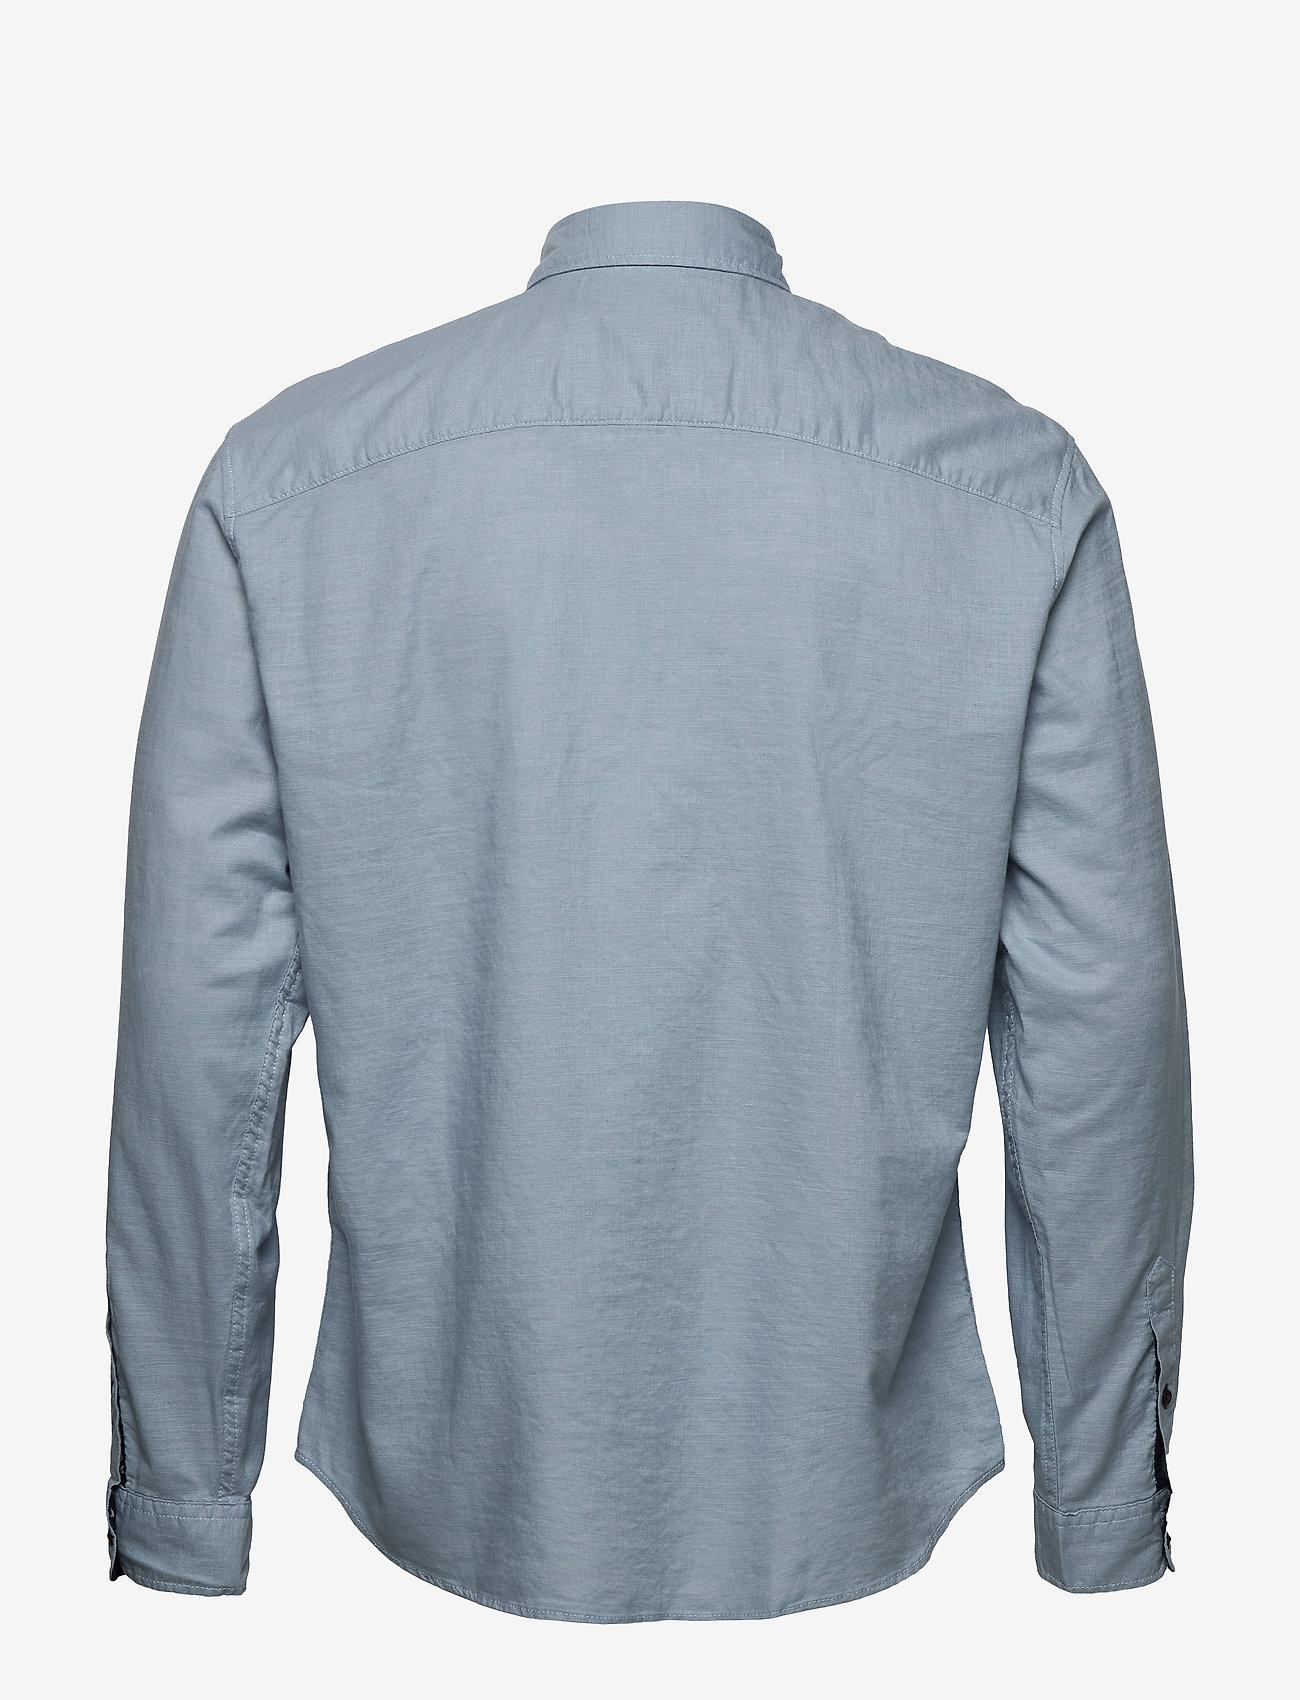 Jack & Jones - JORCHANDLER SHIRT LS - basic skjortor - ashley blue - 1